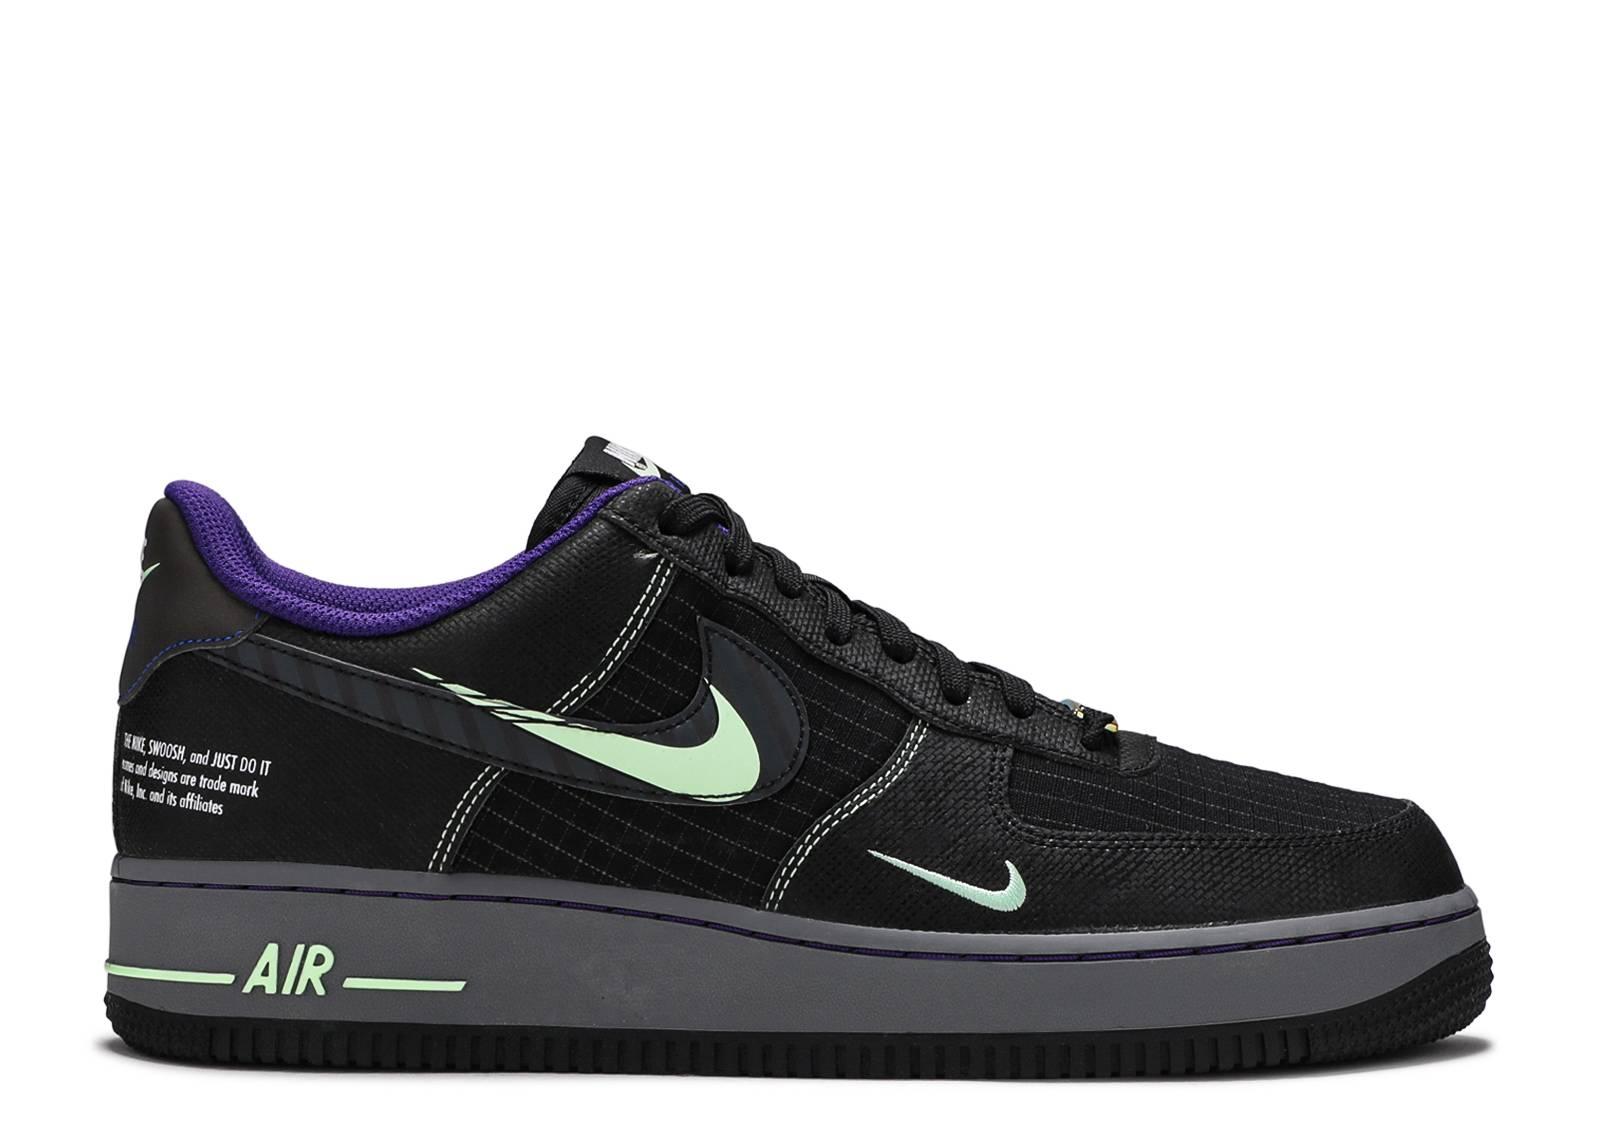 2019 Cheap Nike Air Max 97 Just DO IT Grey Blue Black Green